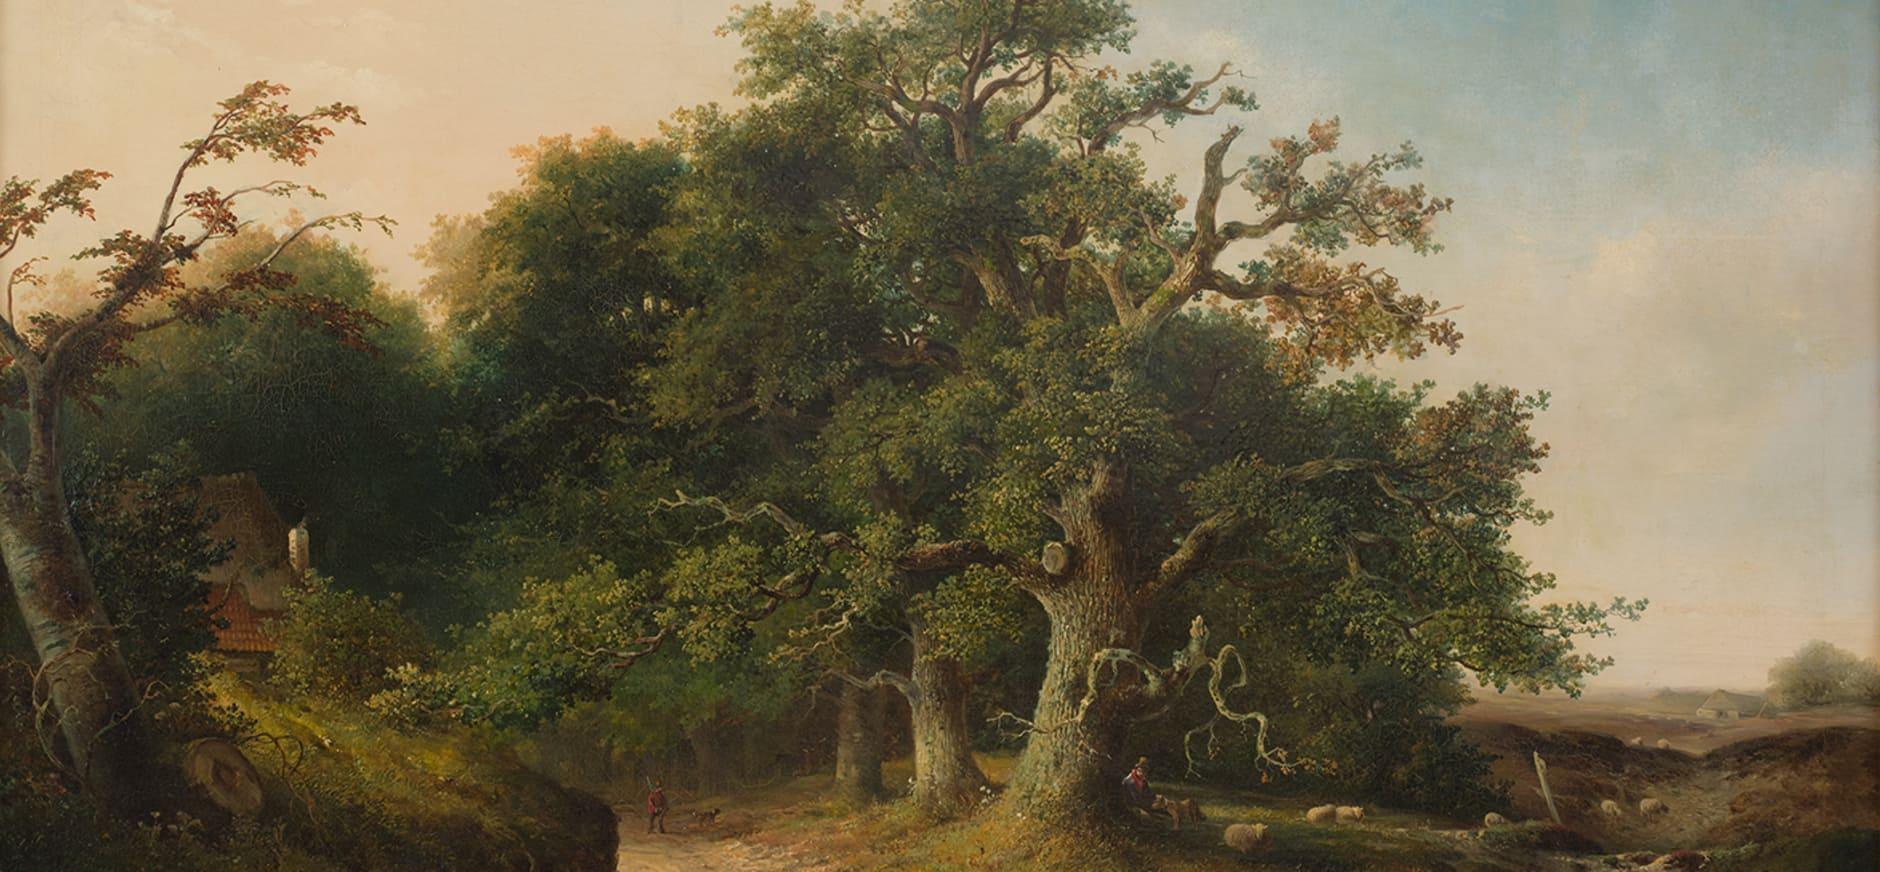 Wodanseiken in Wolfheze - schilderij Jacob Cremer (1849)